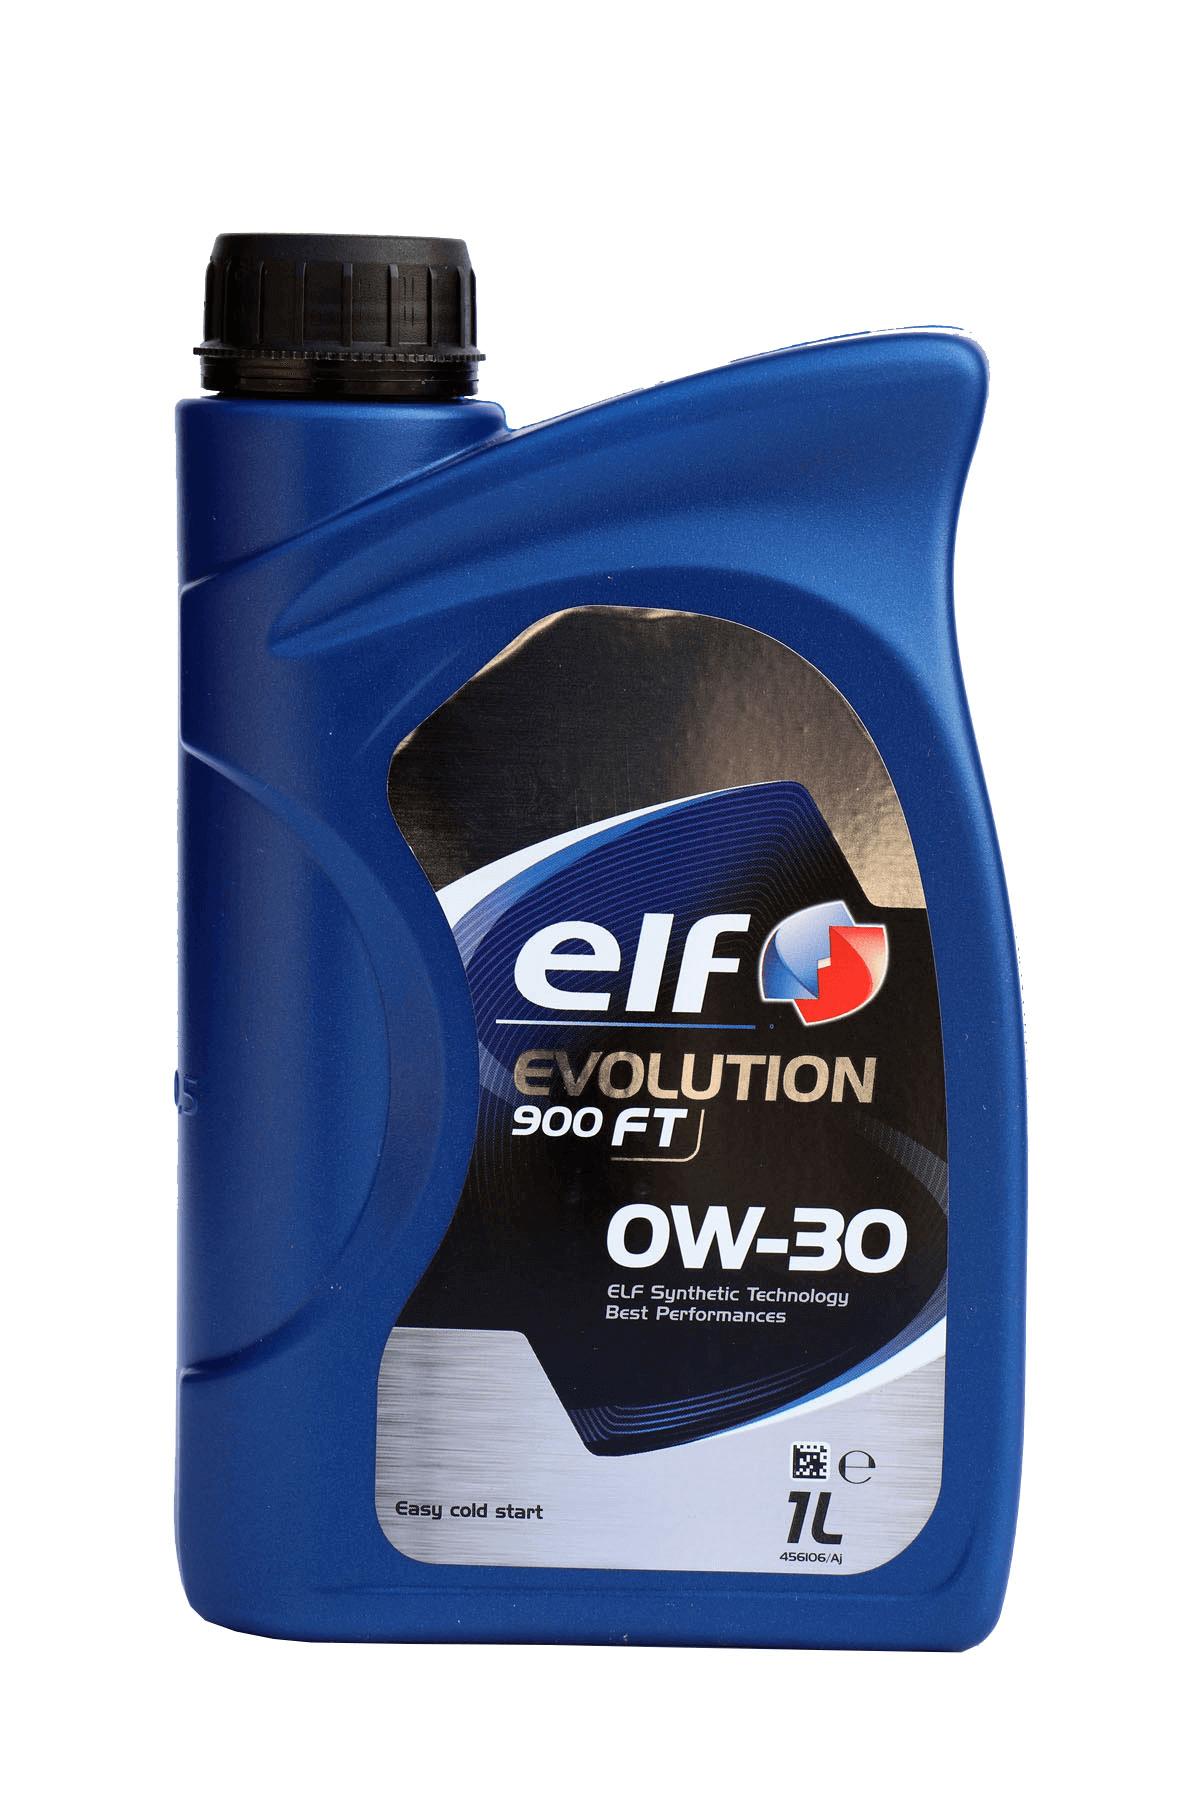 ELF 0W-30 Evolution 900 FT  Motoröl, 1l